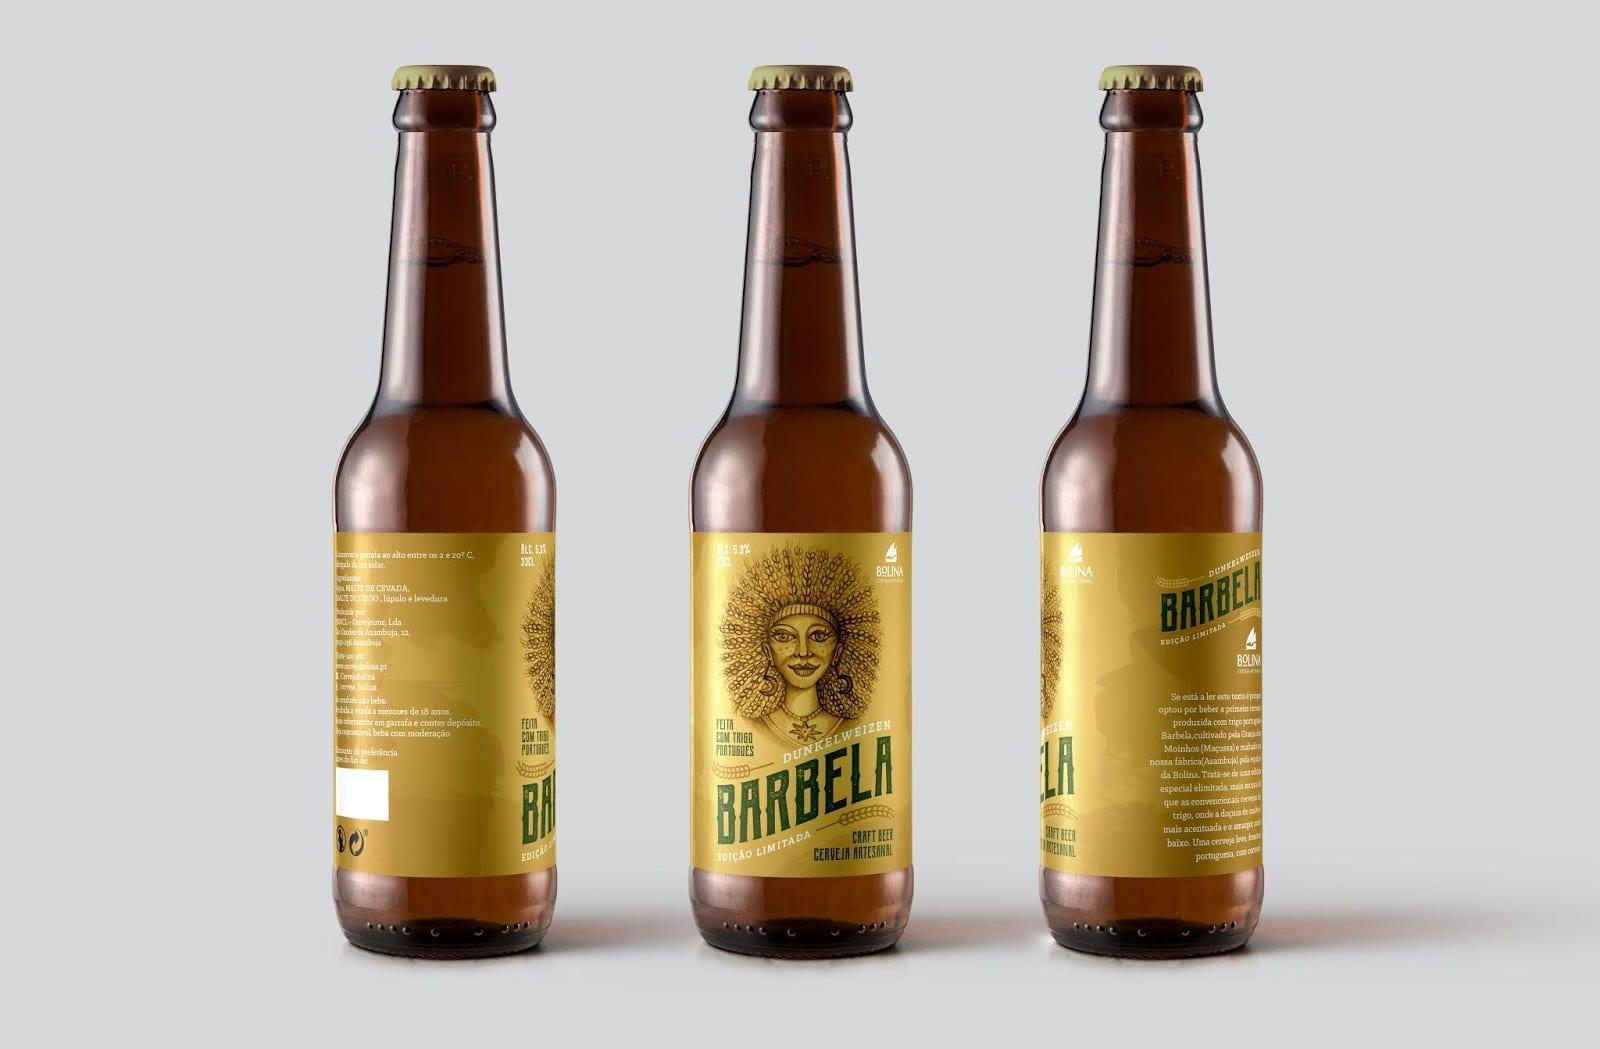 Barbela 04 - Ach, tie obaly – Barbela